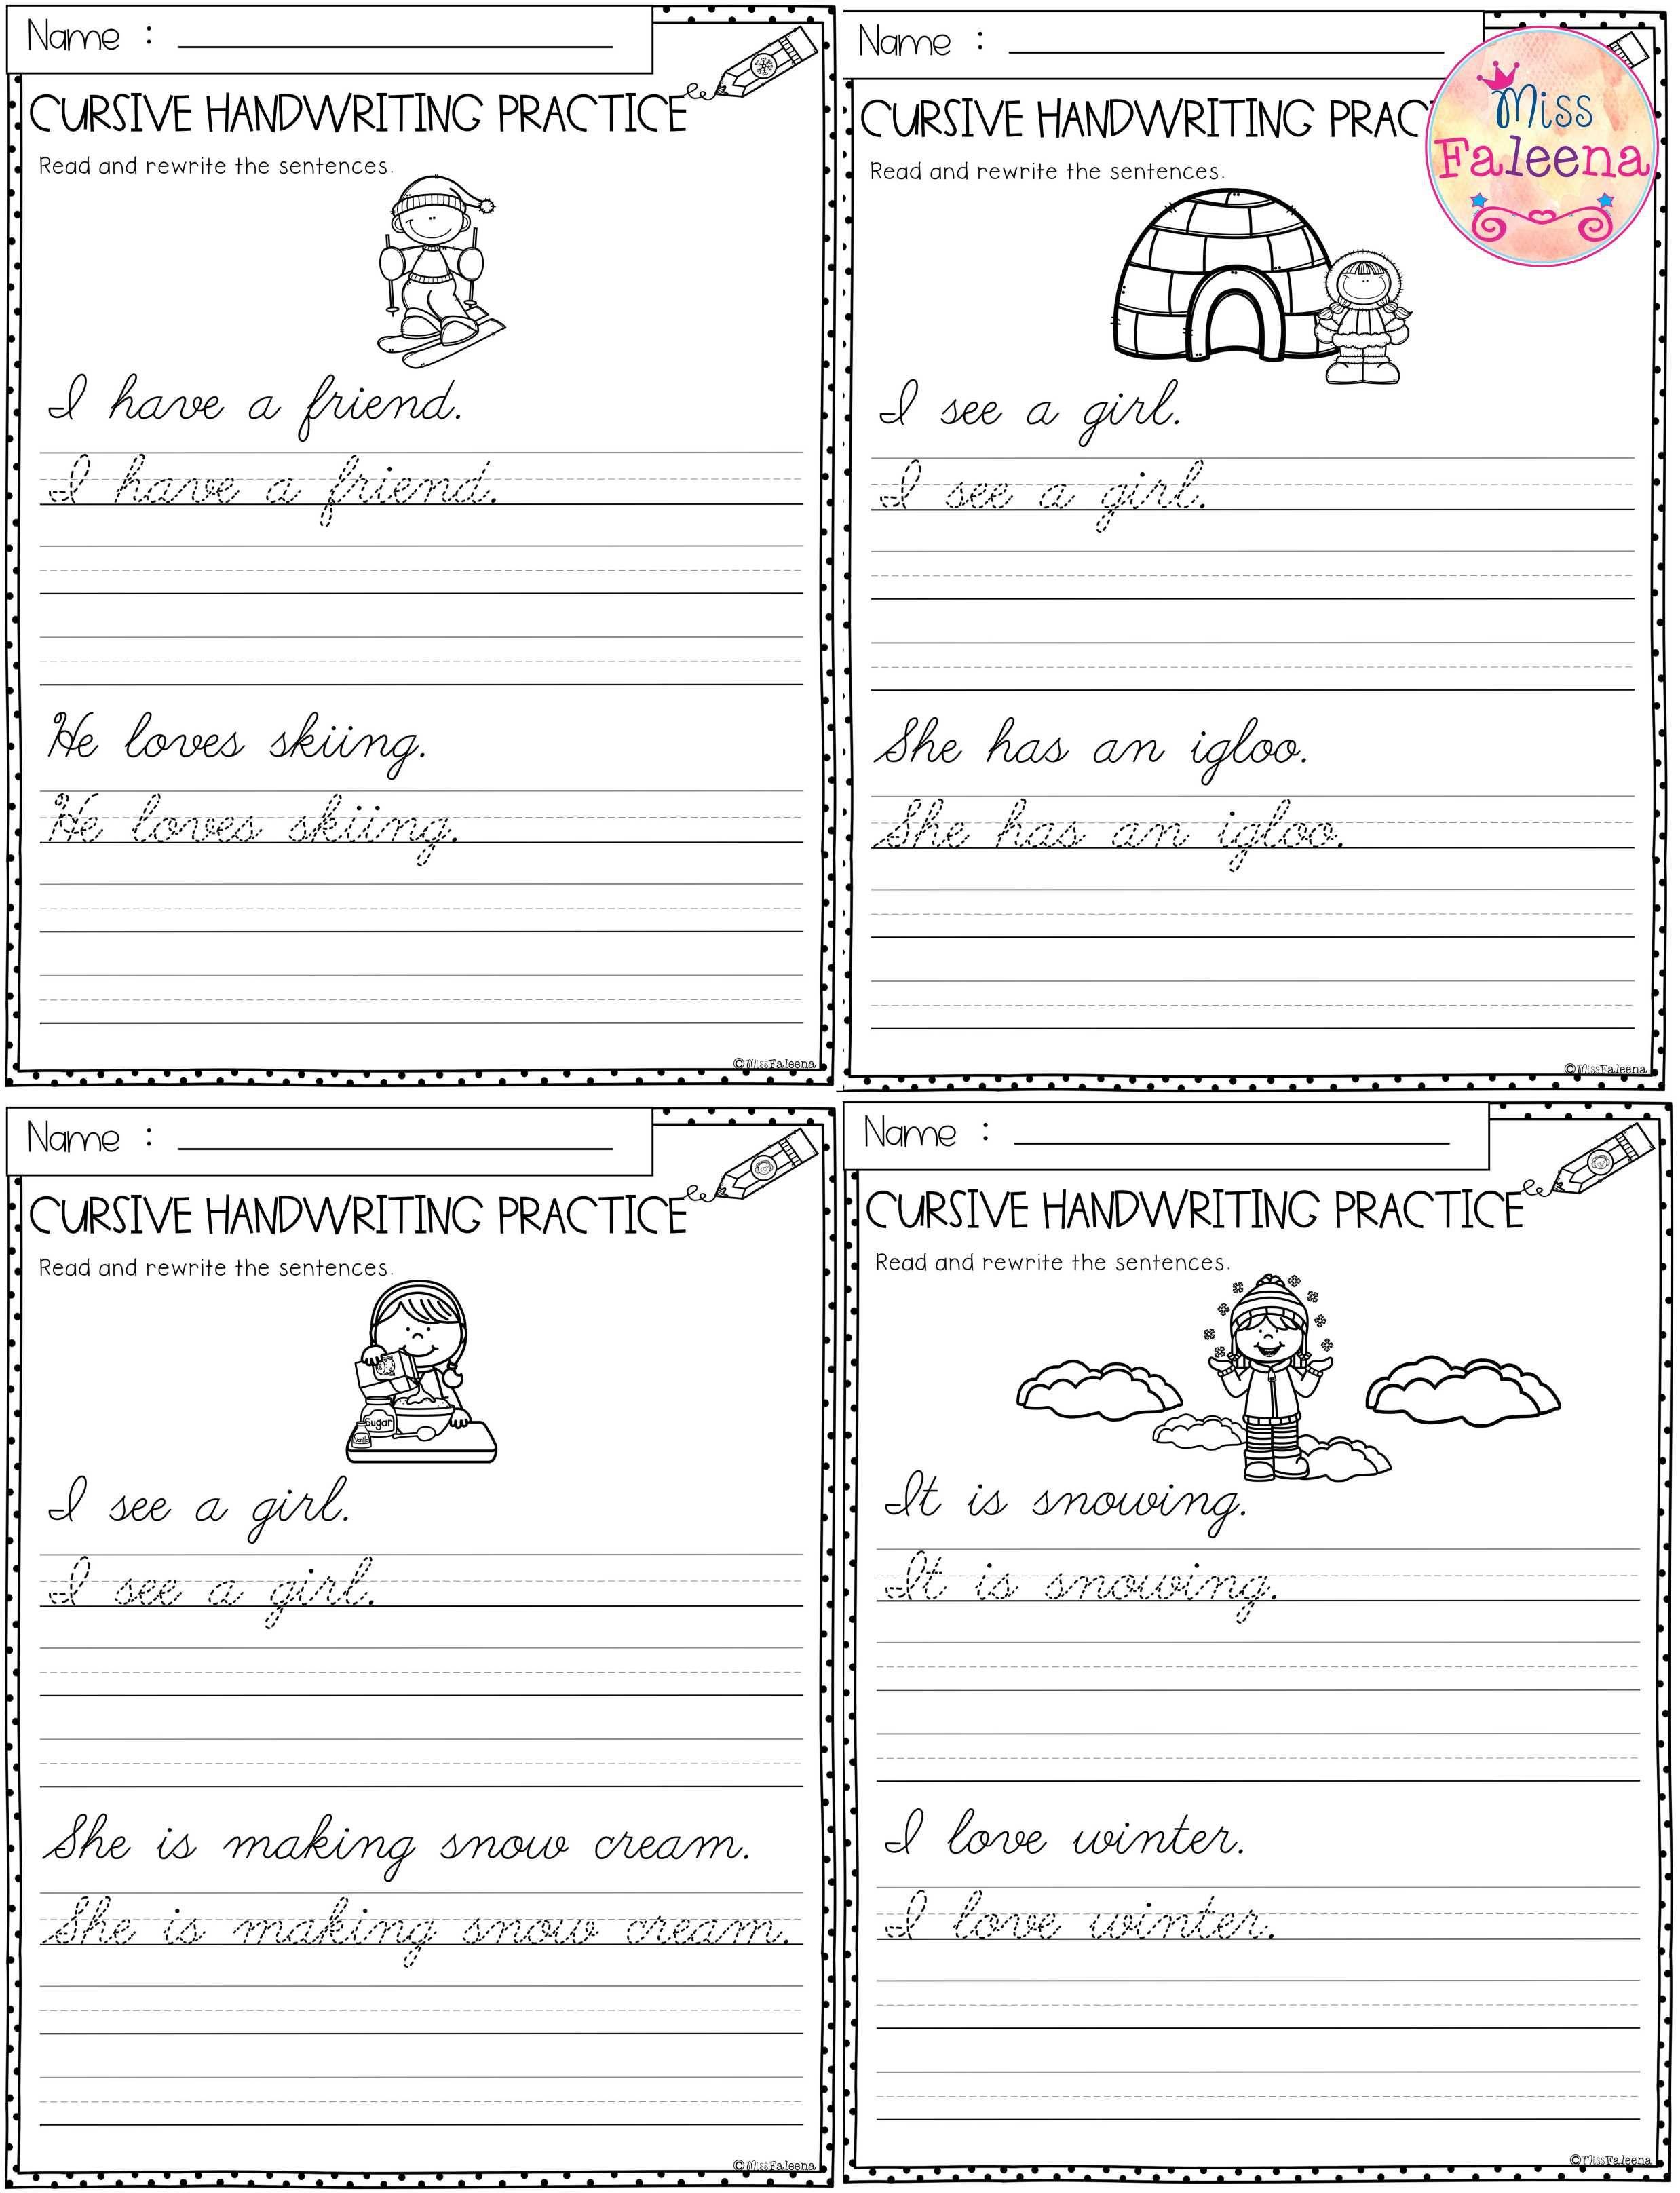 Winter Cursive Handwriting Practice